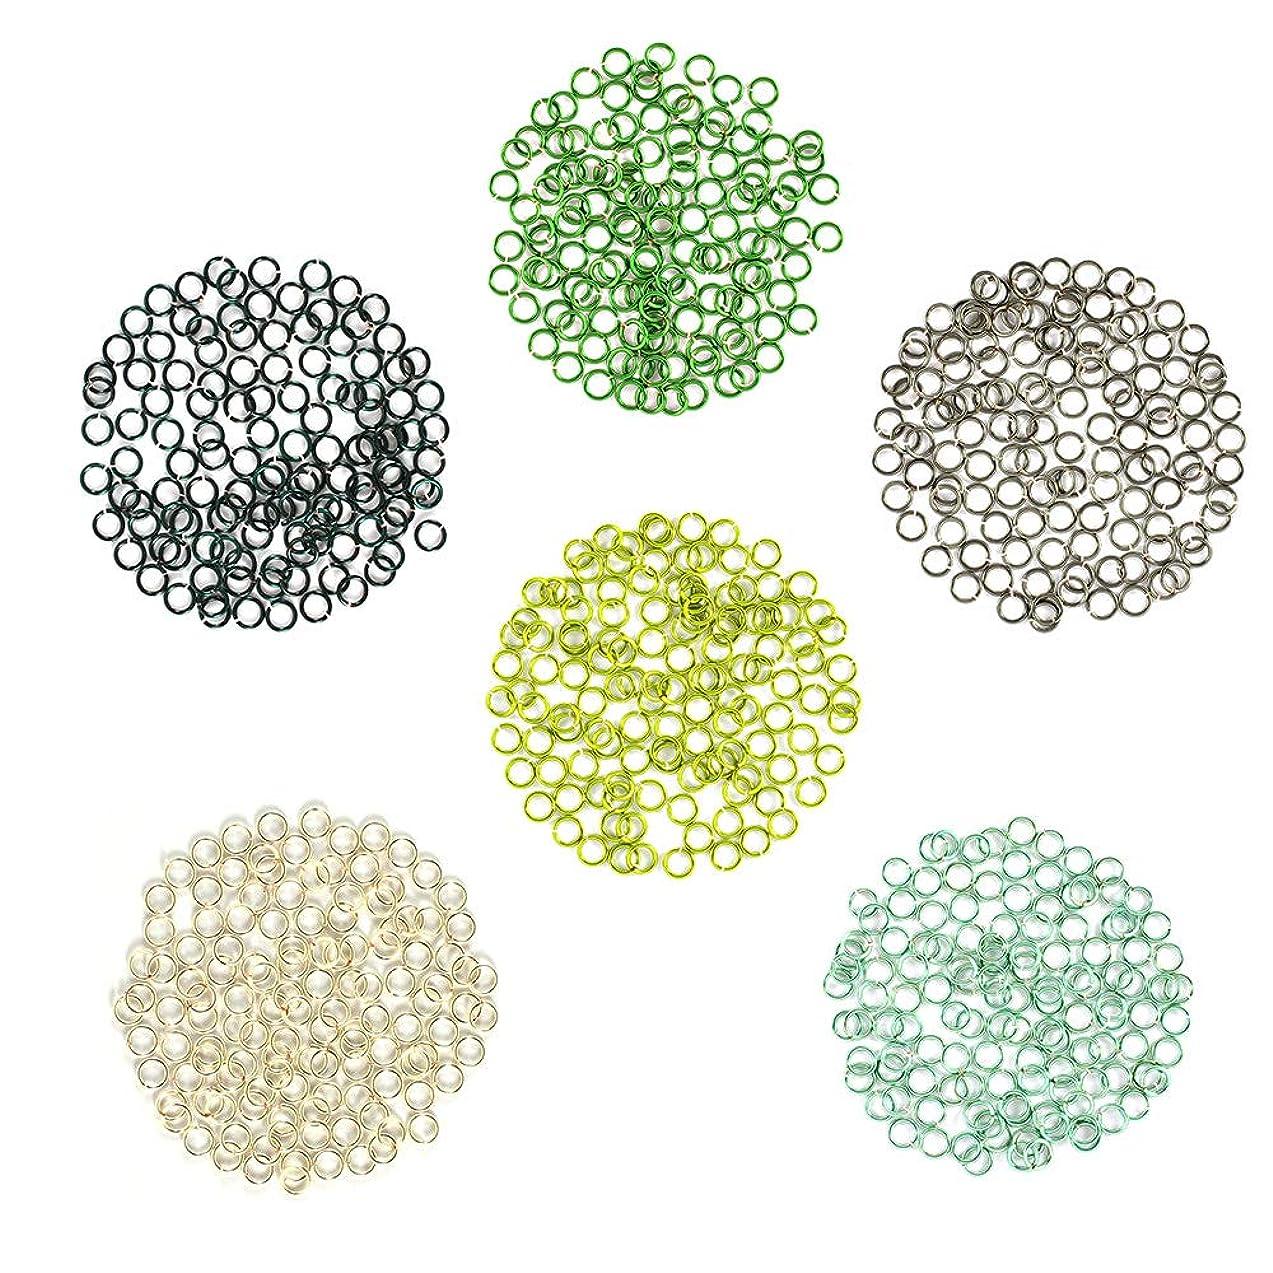 Forest Flora - Enameled Copper Jump Rings – 22 Gauge – 3.5mm ID - 600 Rings - Green, Hematite, Peridot, Seafoam, Silver, Teal